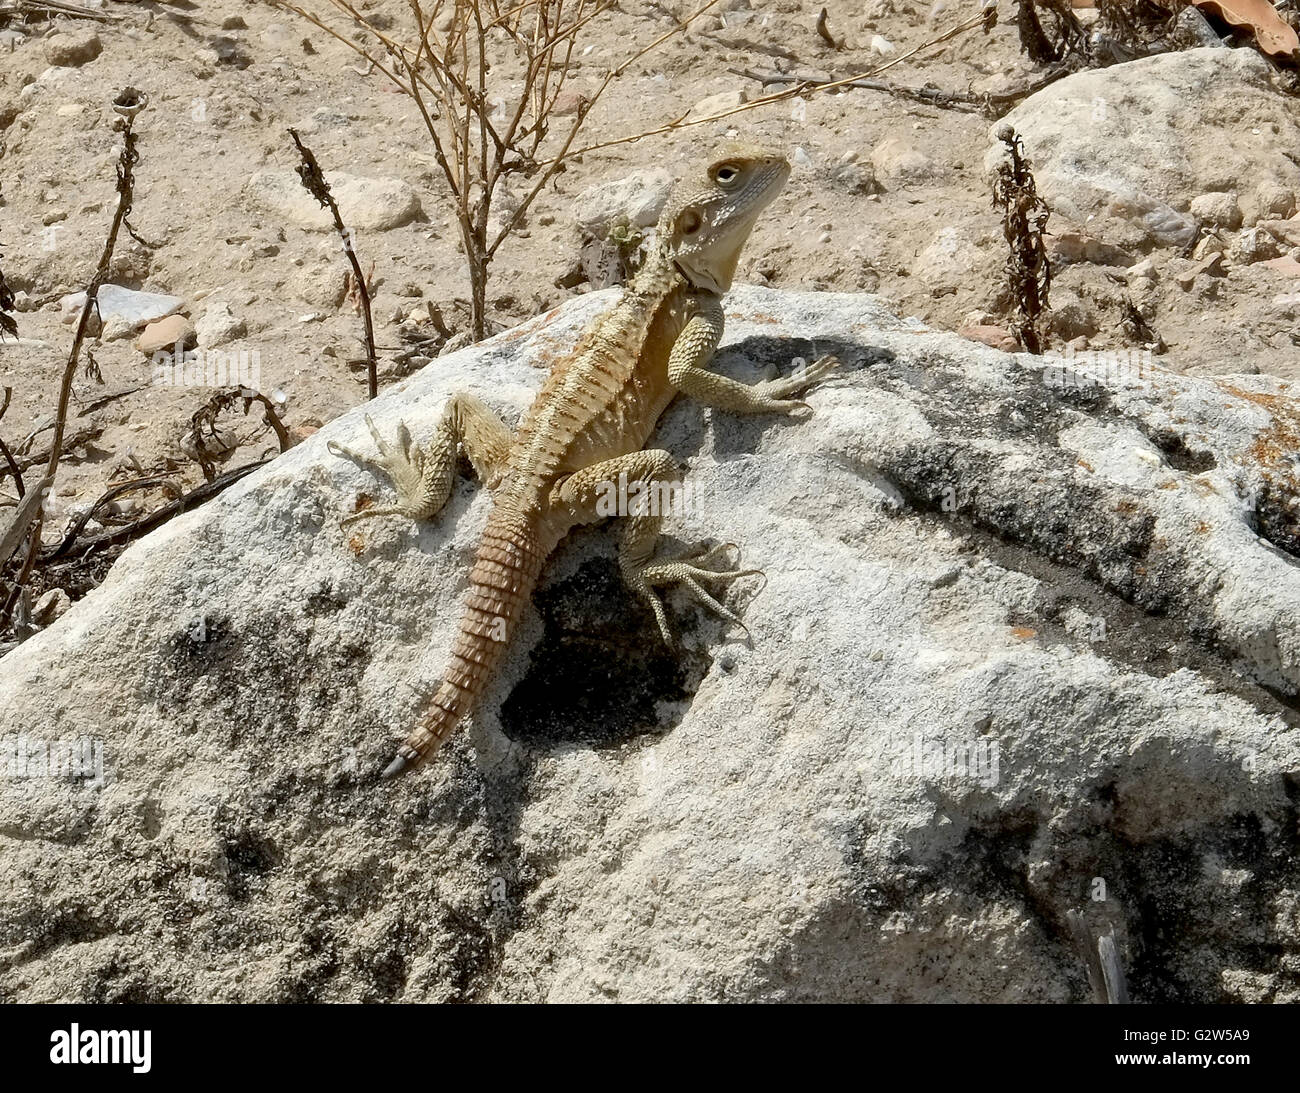 Gecko Lizard (infraorder Gekkota) on a rock,  Salamis, Famagusta, (Gazimagusa),  Northern Cyprus. - Stock Image